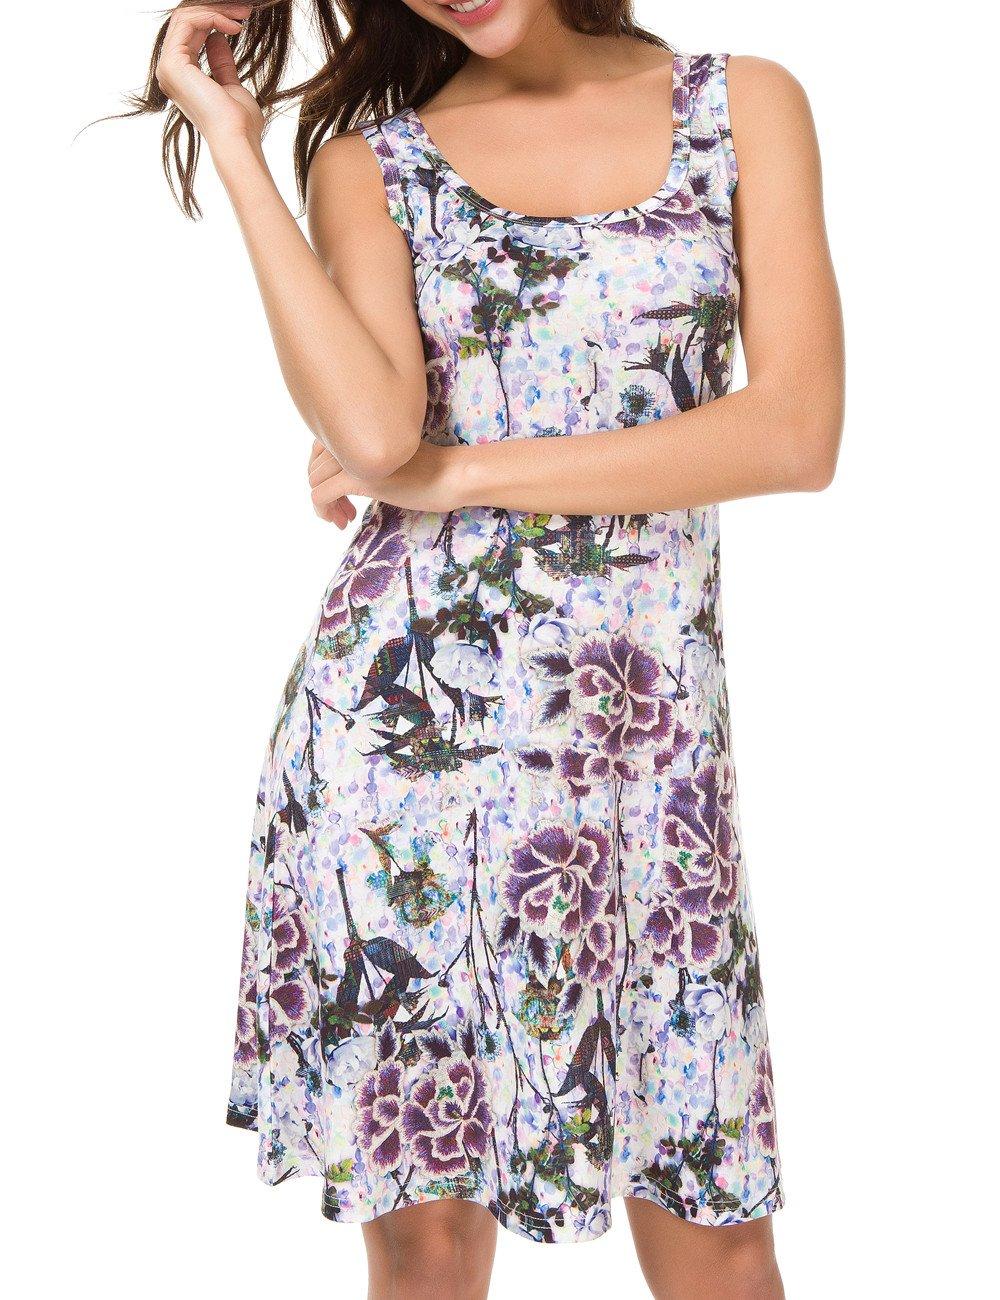 0475da2bd7da Galleon - Herou Women Sleeveless Beach Casual Flared Floral Tank Dress (XX- Large, Flower-34)